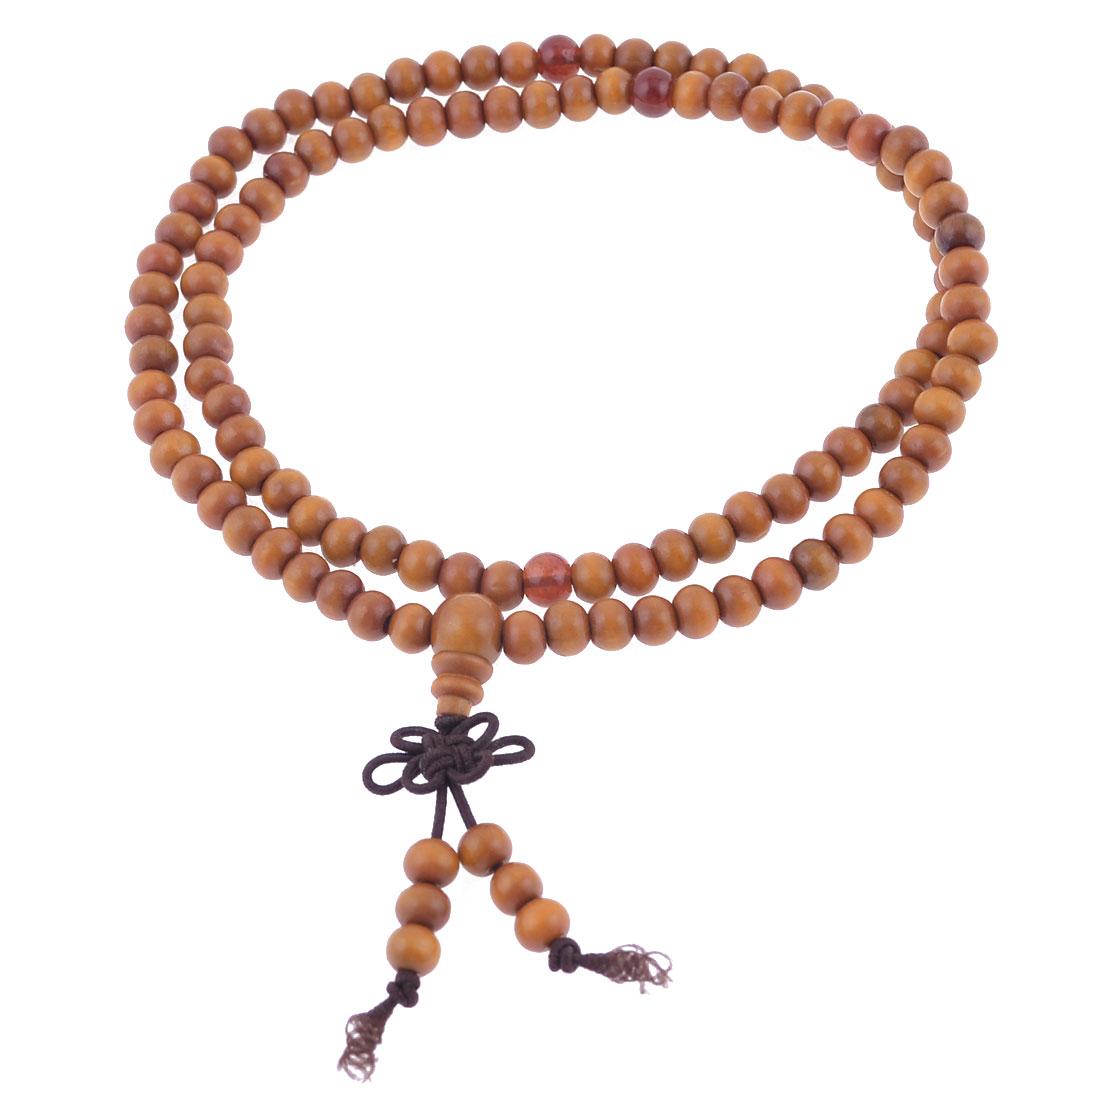 Stretch Strap 6mm Diameter Beads Sandalwood Buddhist Prayer Necklace Orange